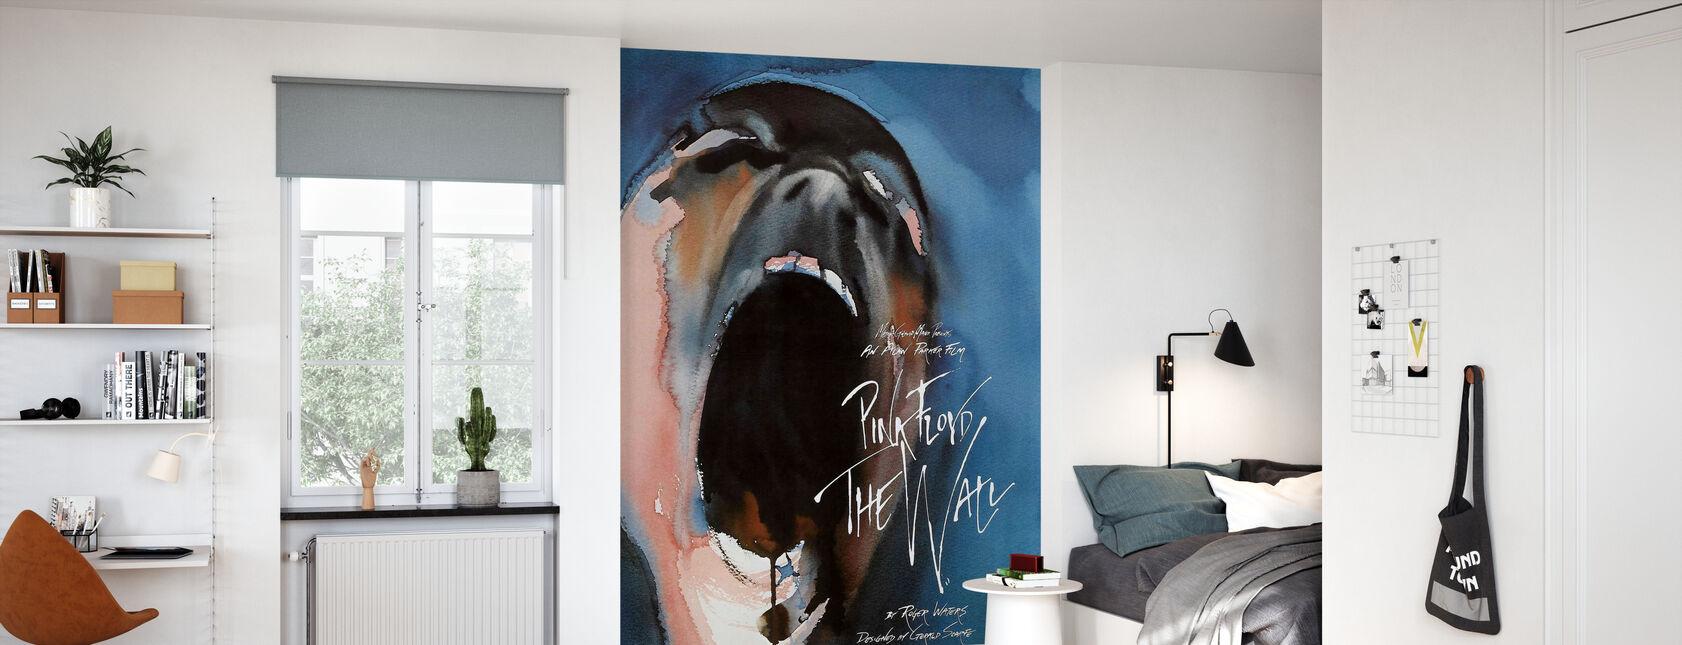 Wand - Pink Floyd - Tapete - Kinderzimmer